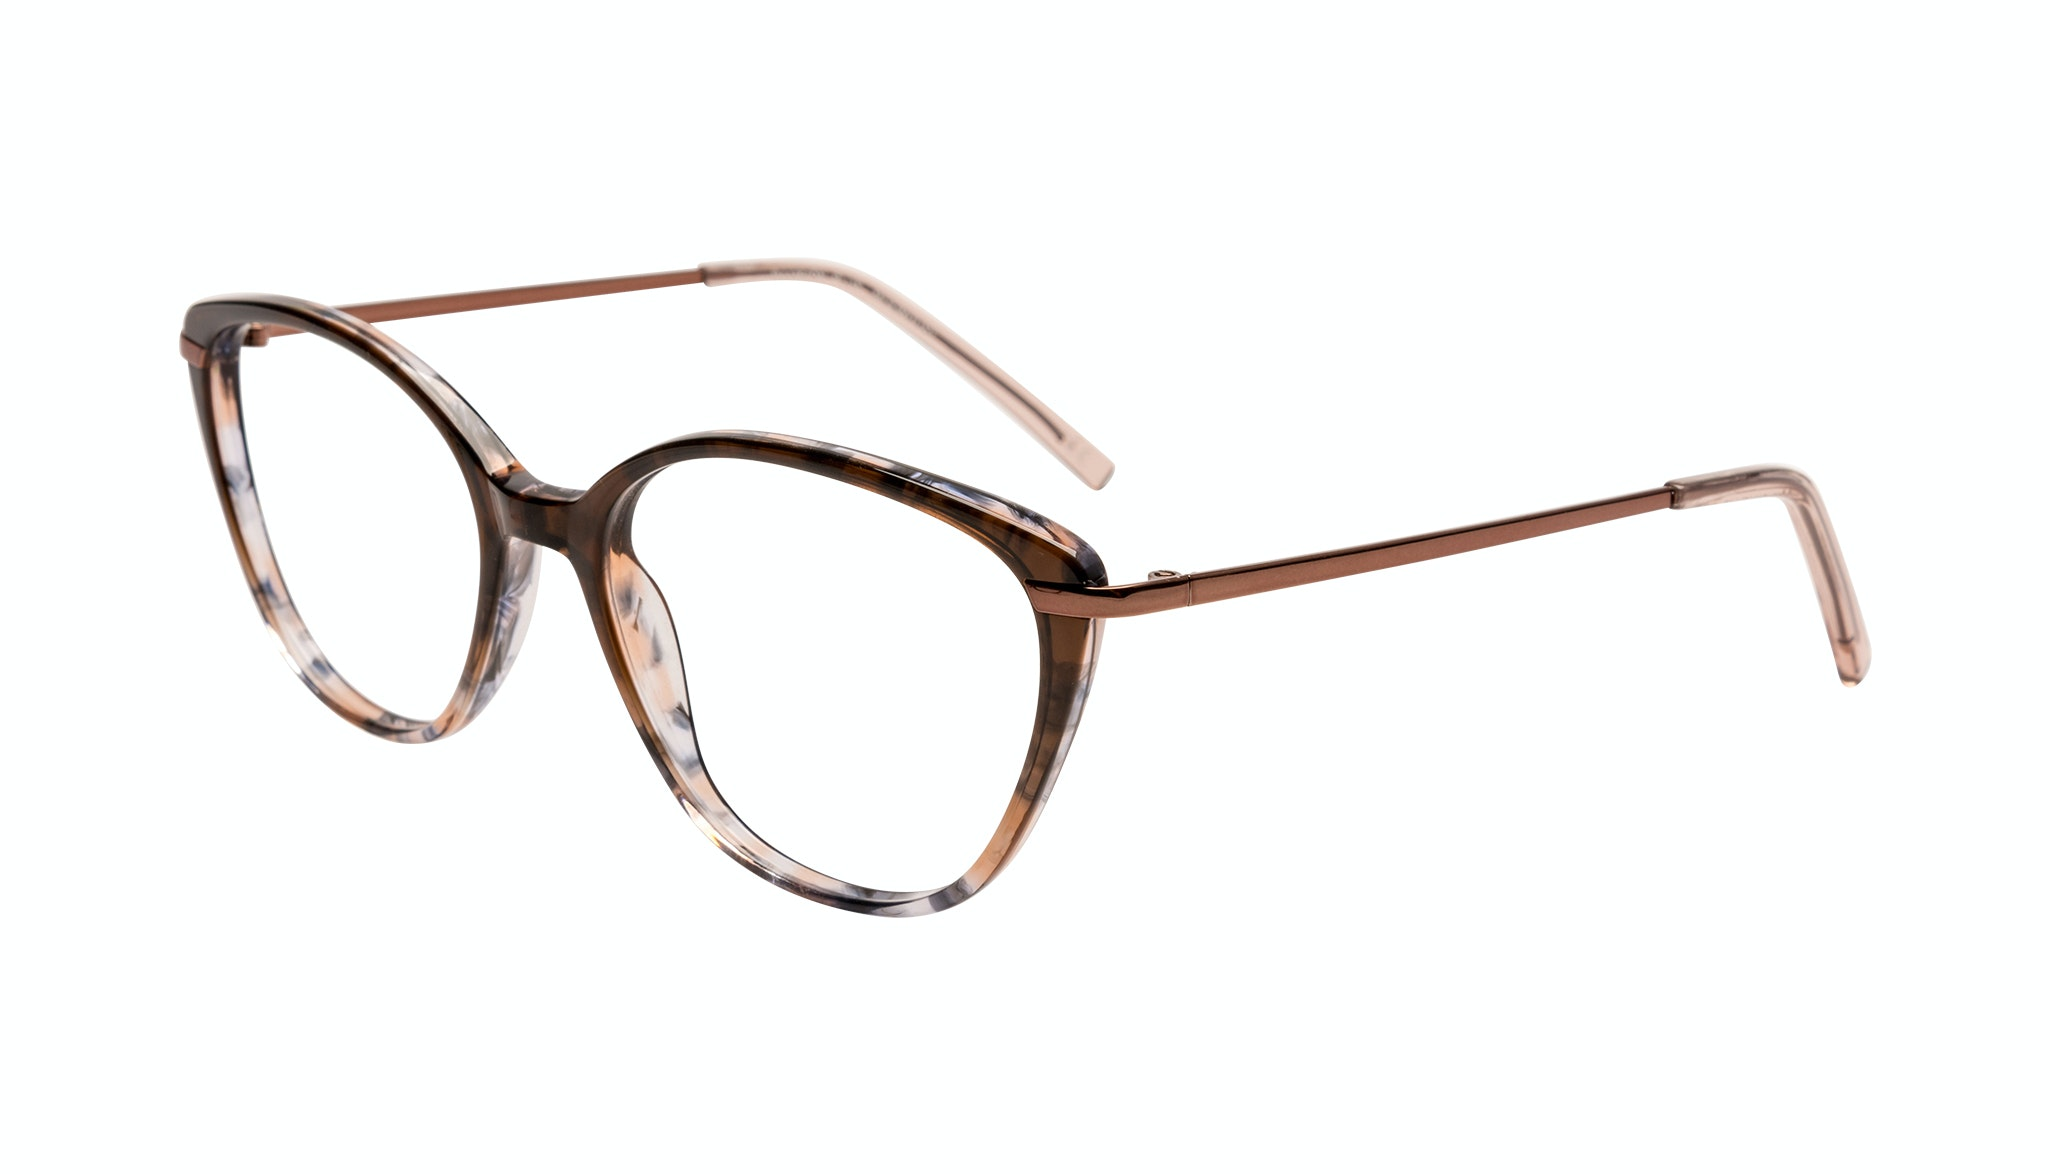 Affordable Fashion Glasses Cat Eye Eyeglasses Women Illusion Plus Moondust Tilt